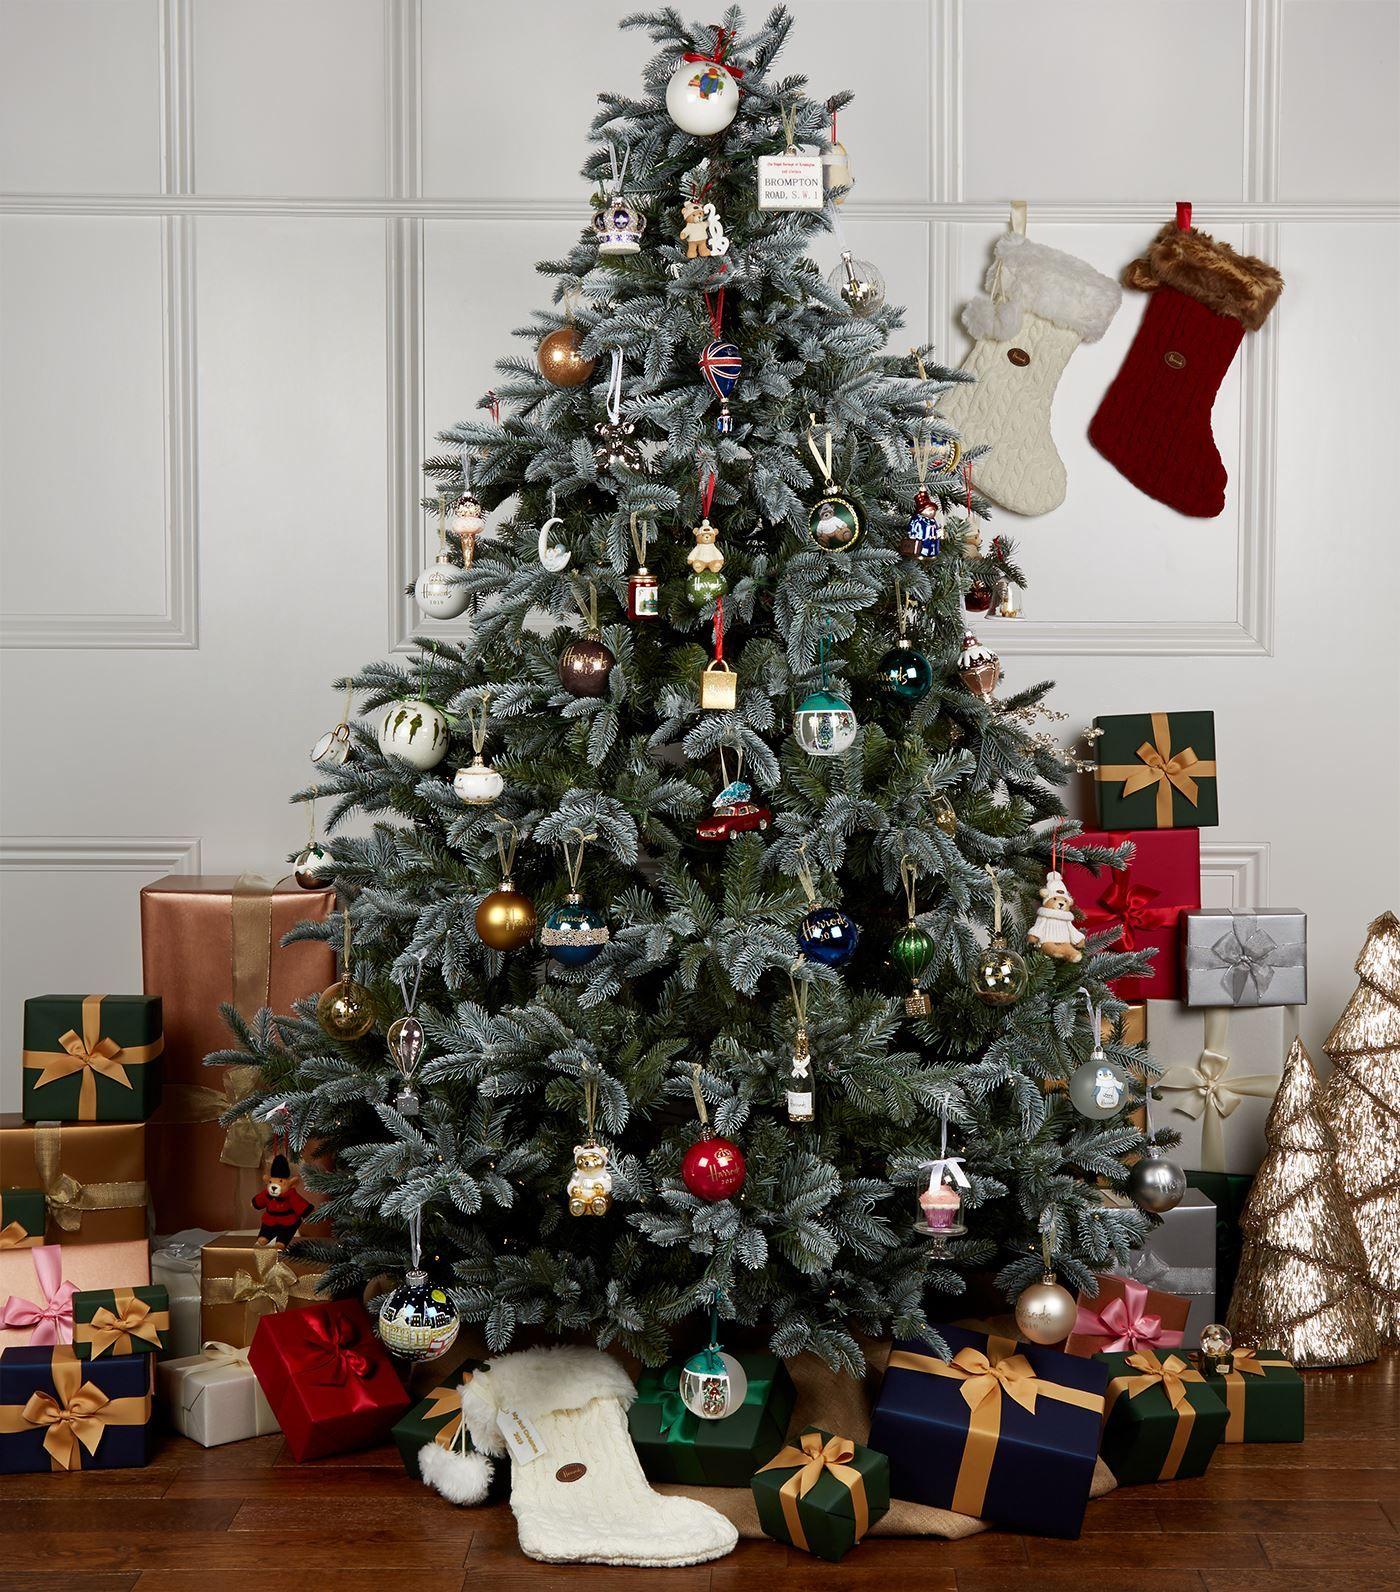 Harrods Joshua Christmas Bear 2019 Snow Globe Decoration Ad Affiliate Christmas Bear In 2020 Xmas Tree Decorations Luxury Christmas Tree Christmas Tree Design